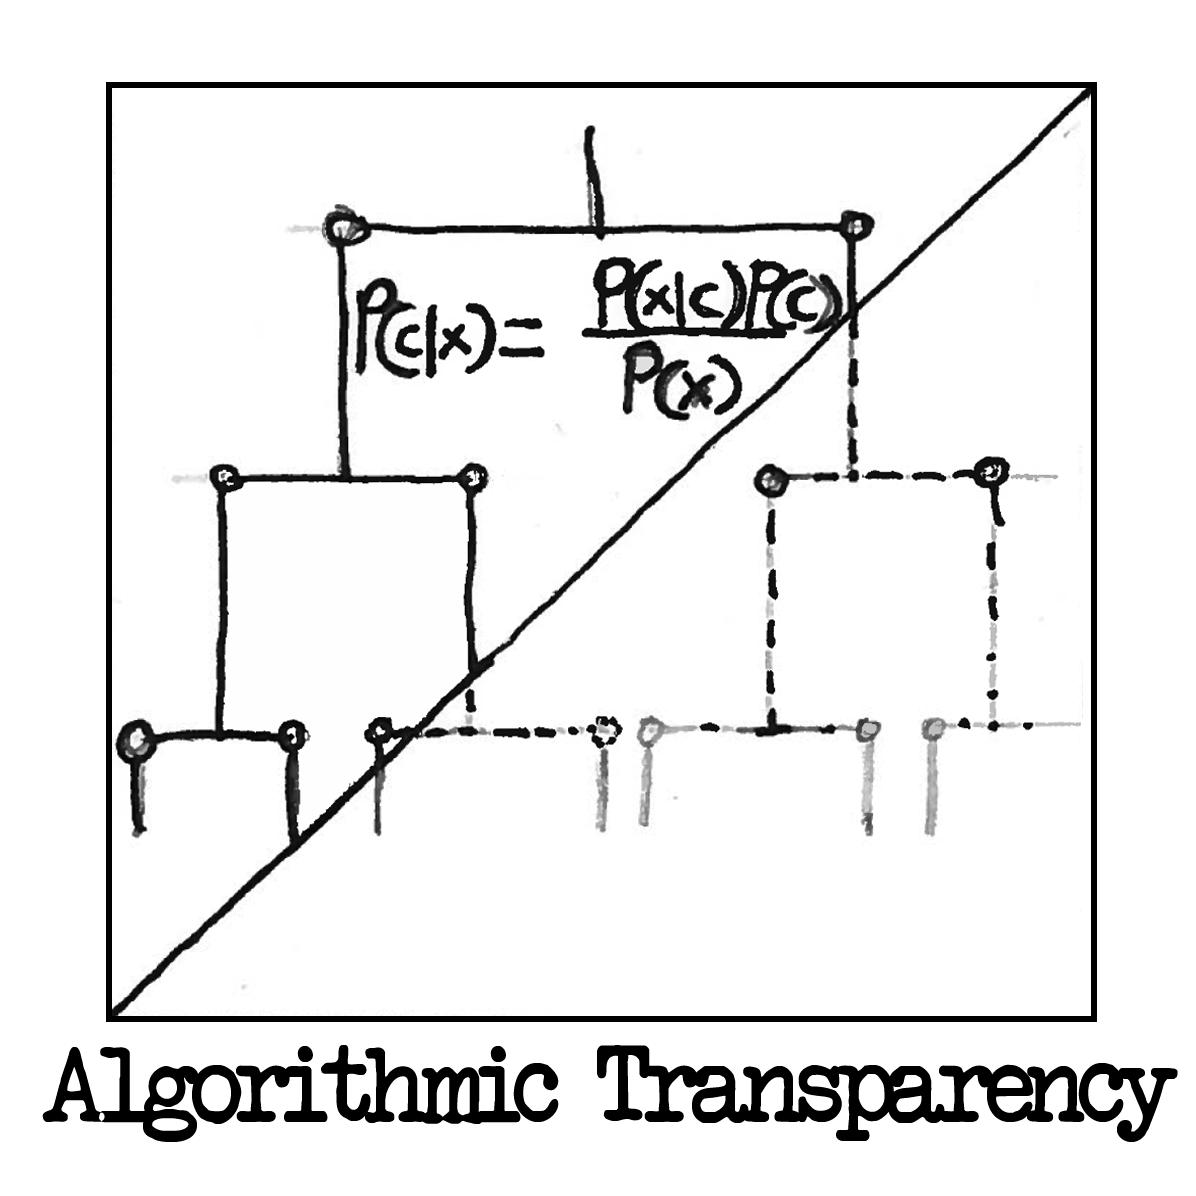 Algorithmictransparency